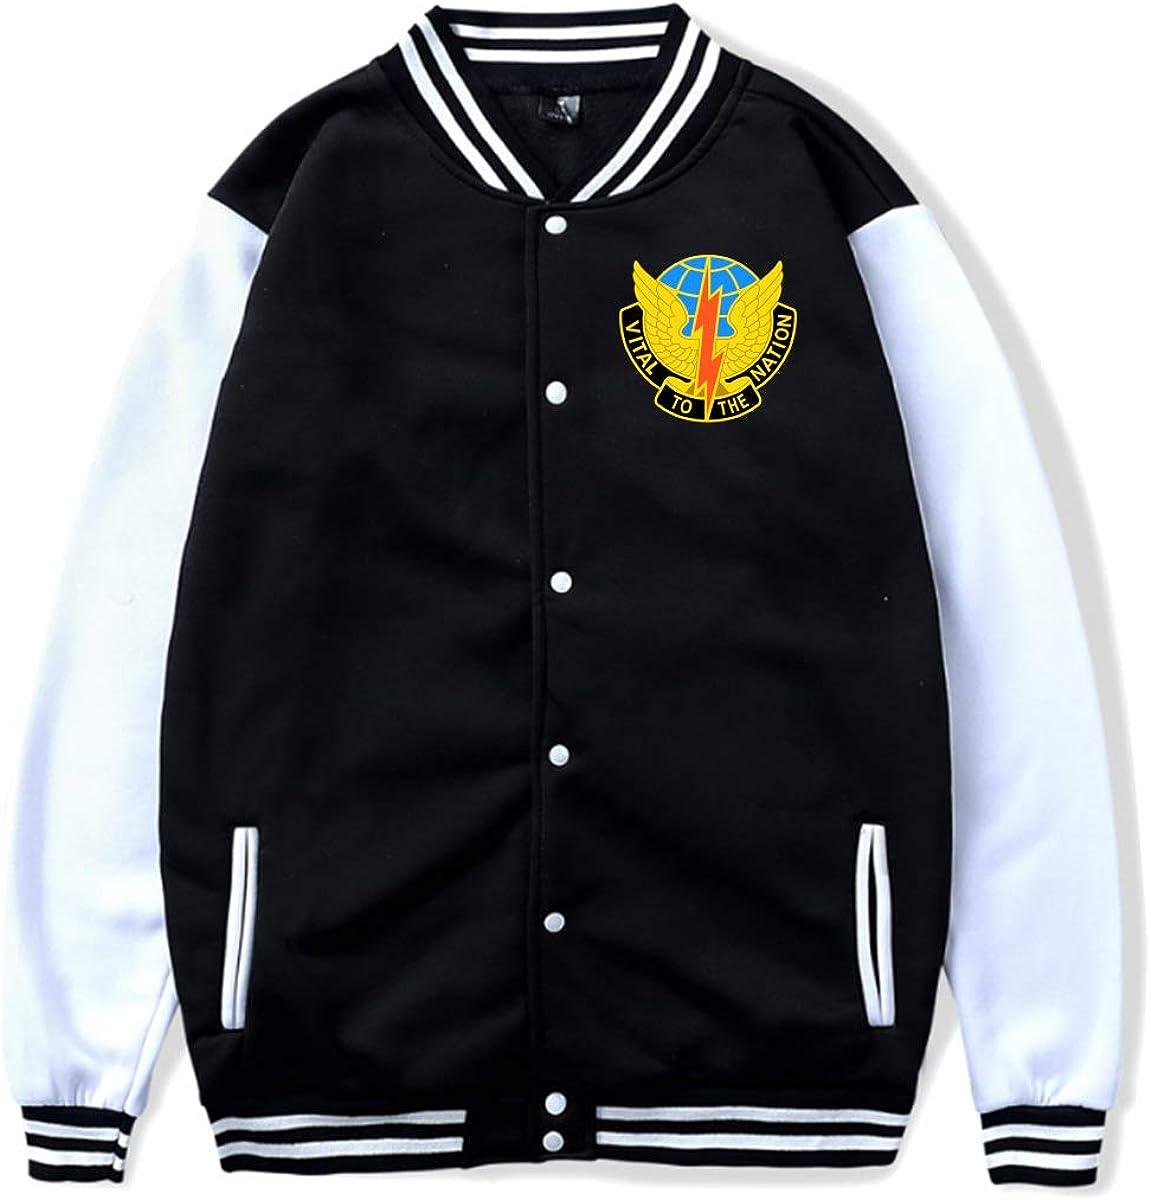 Army 1101st Signal Brigade Unit Crest Baseball Uniform Jacket Sport Coat